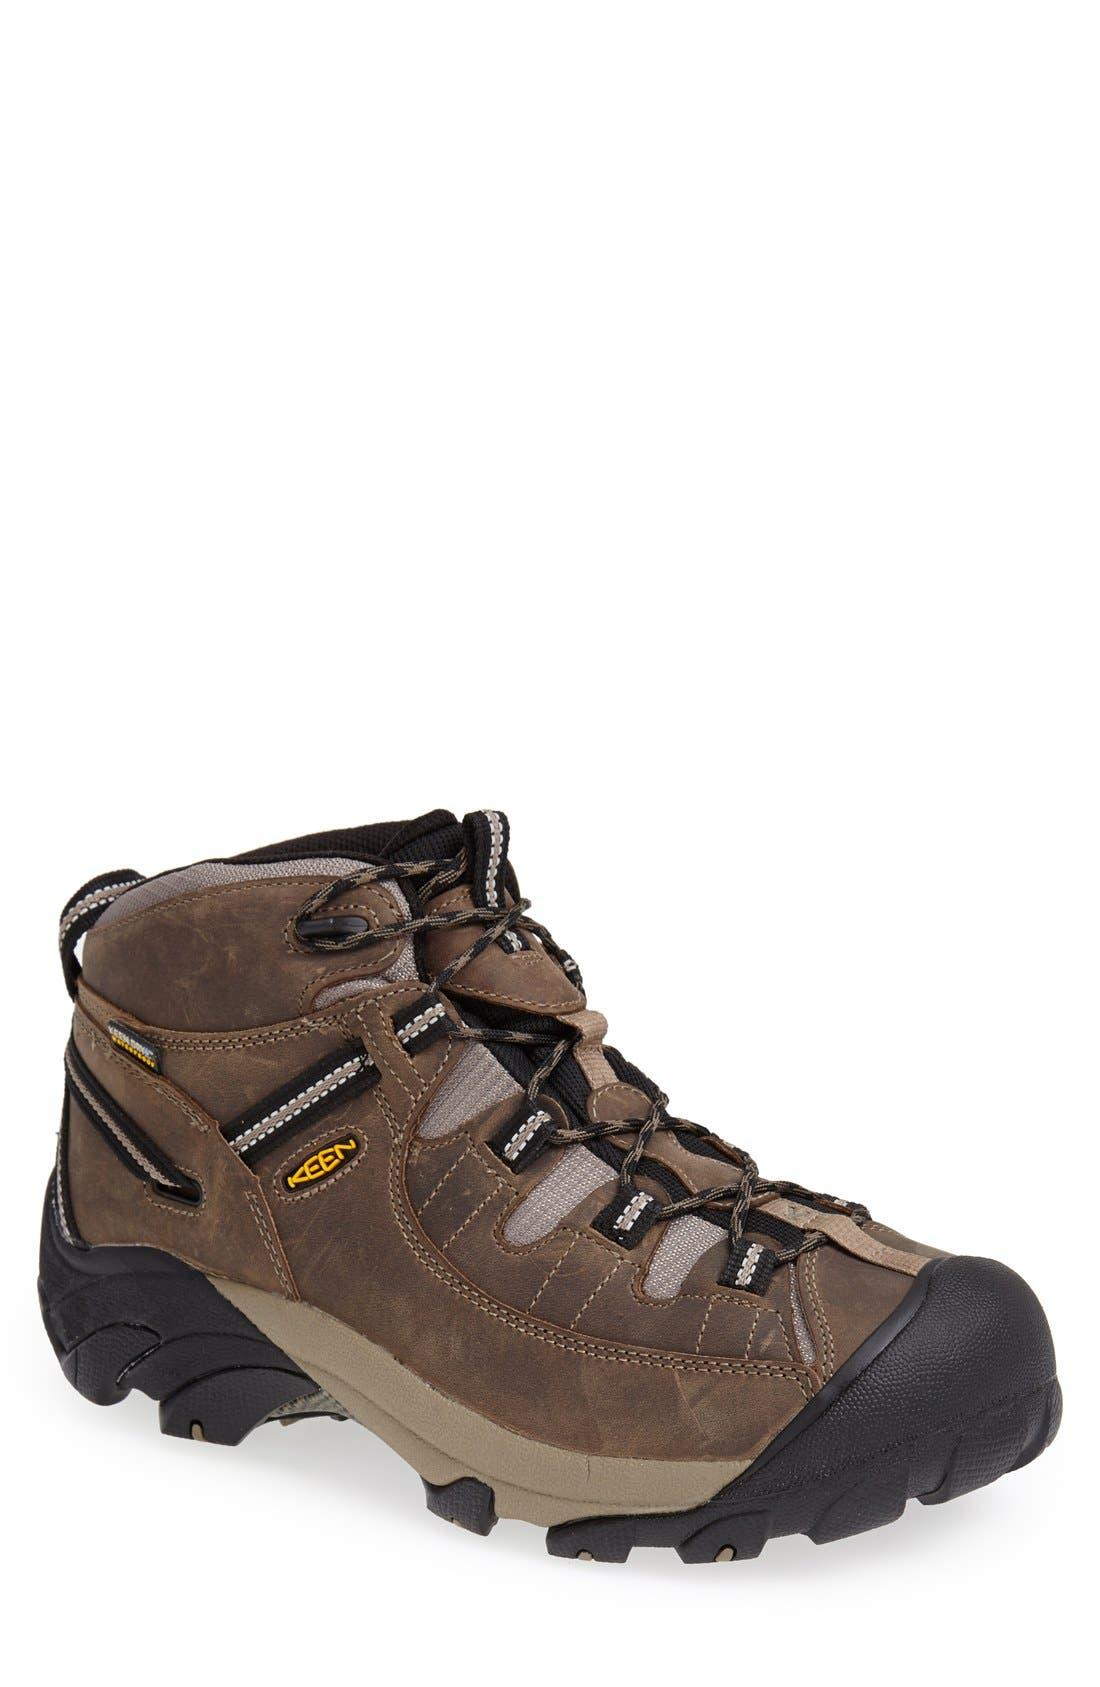 Targhee II Mid Hiking Waterproof Boot,                         Main,                         color, SHITAKE/ BRINDLE